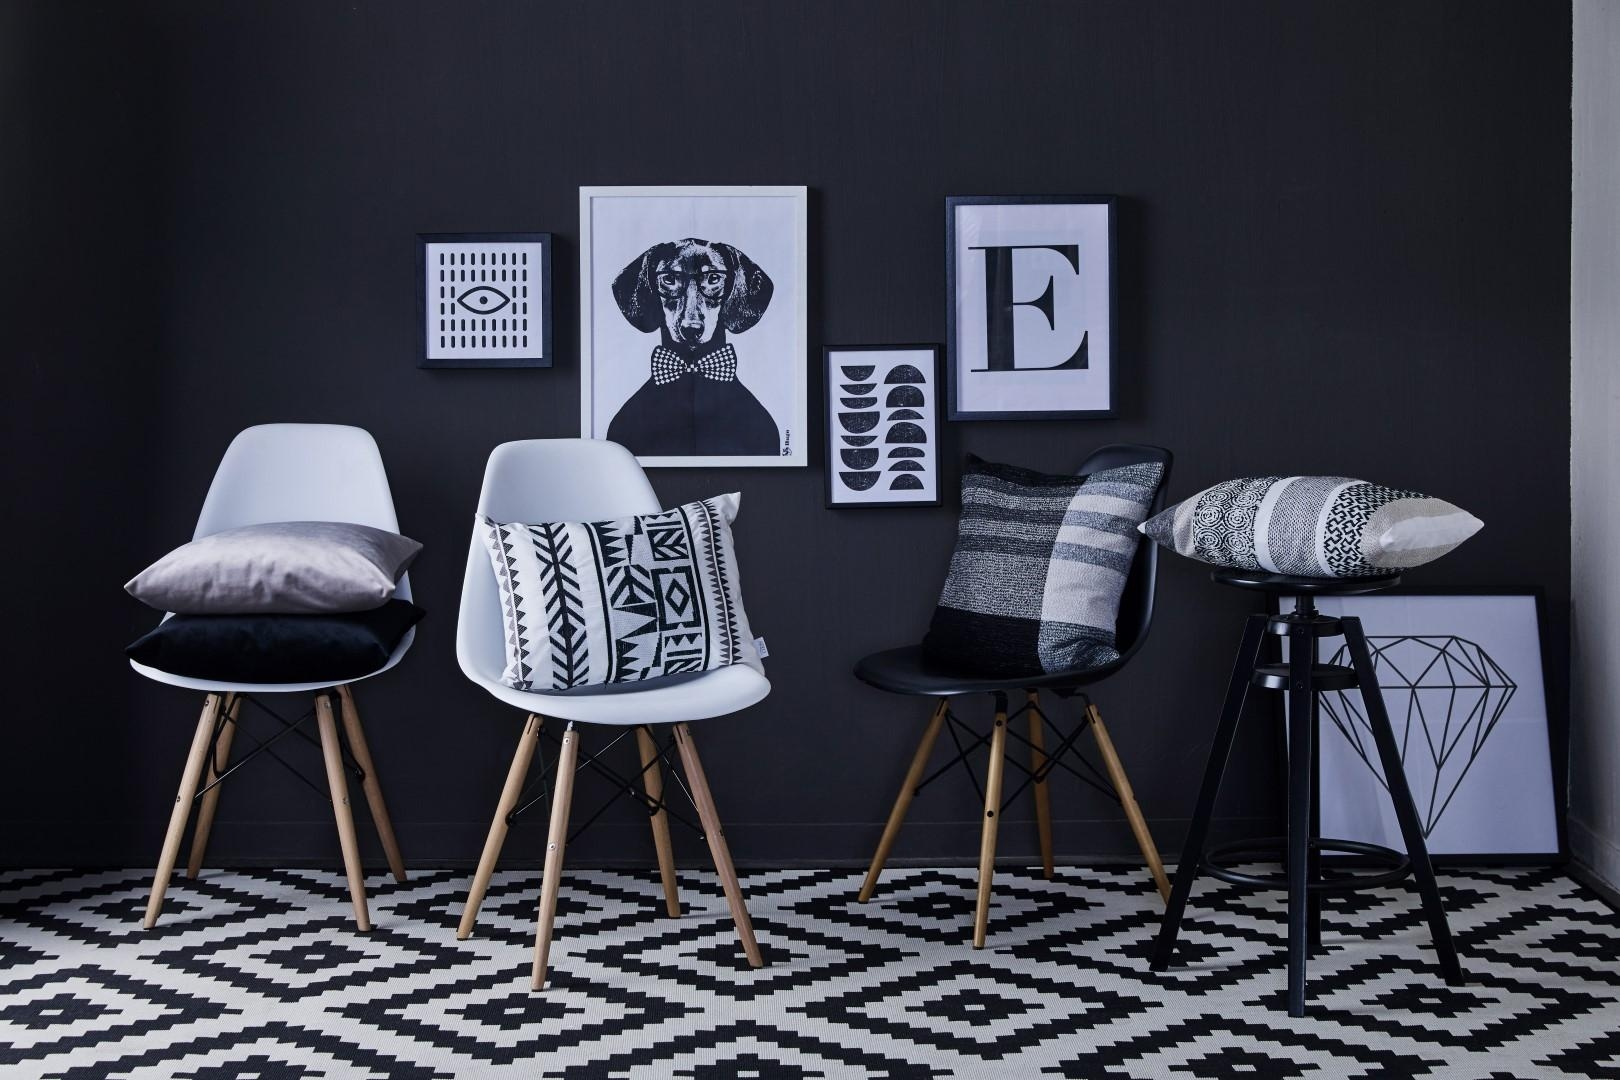 Kissen dekorative wohnideen bei couch - Dekorative wohnidee ...